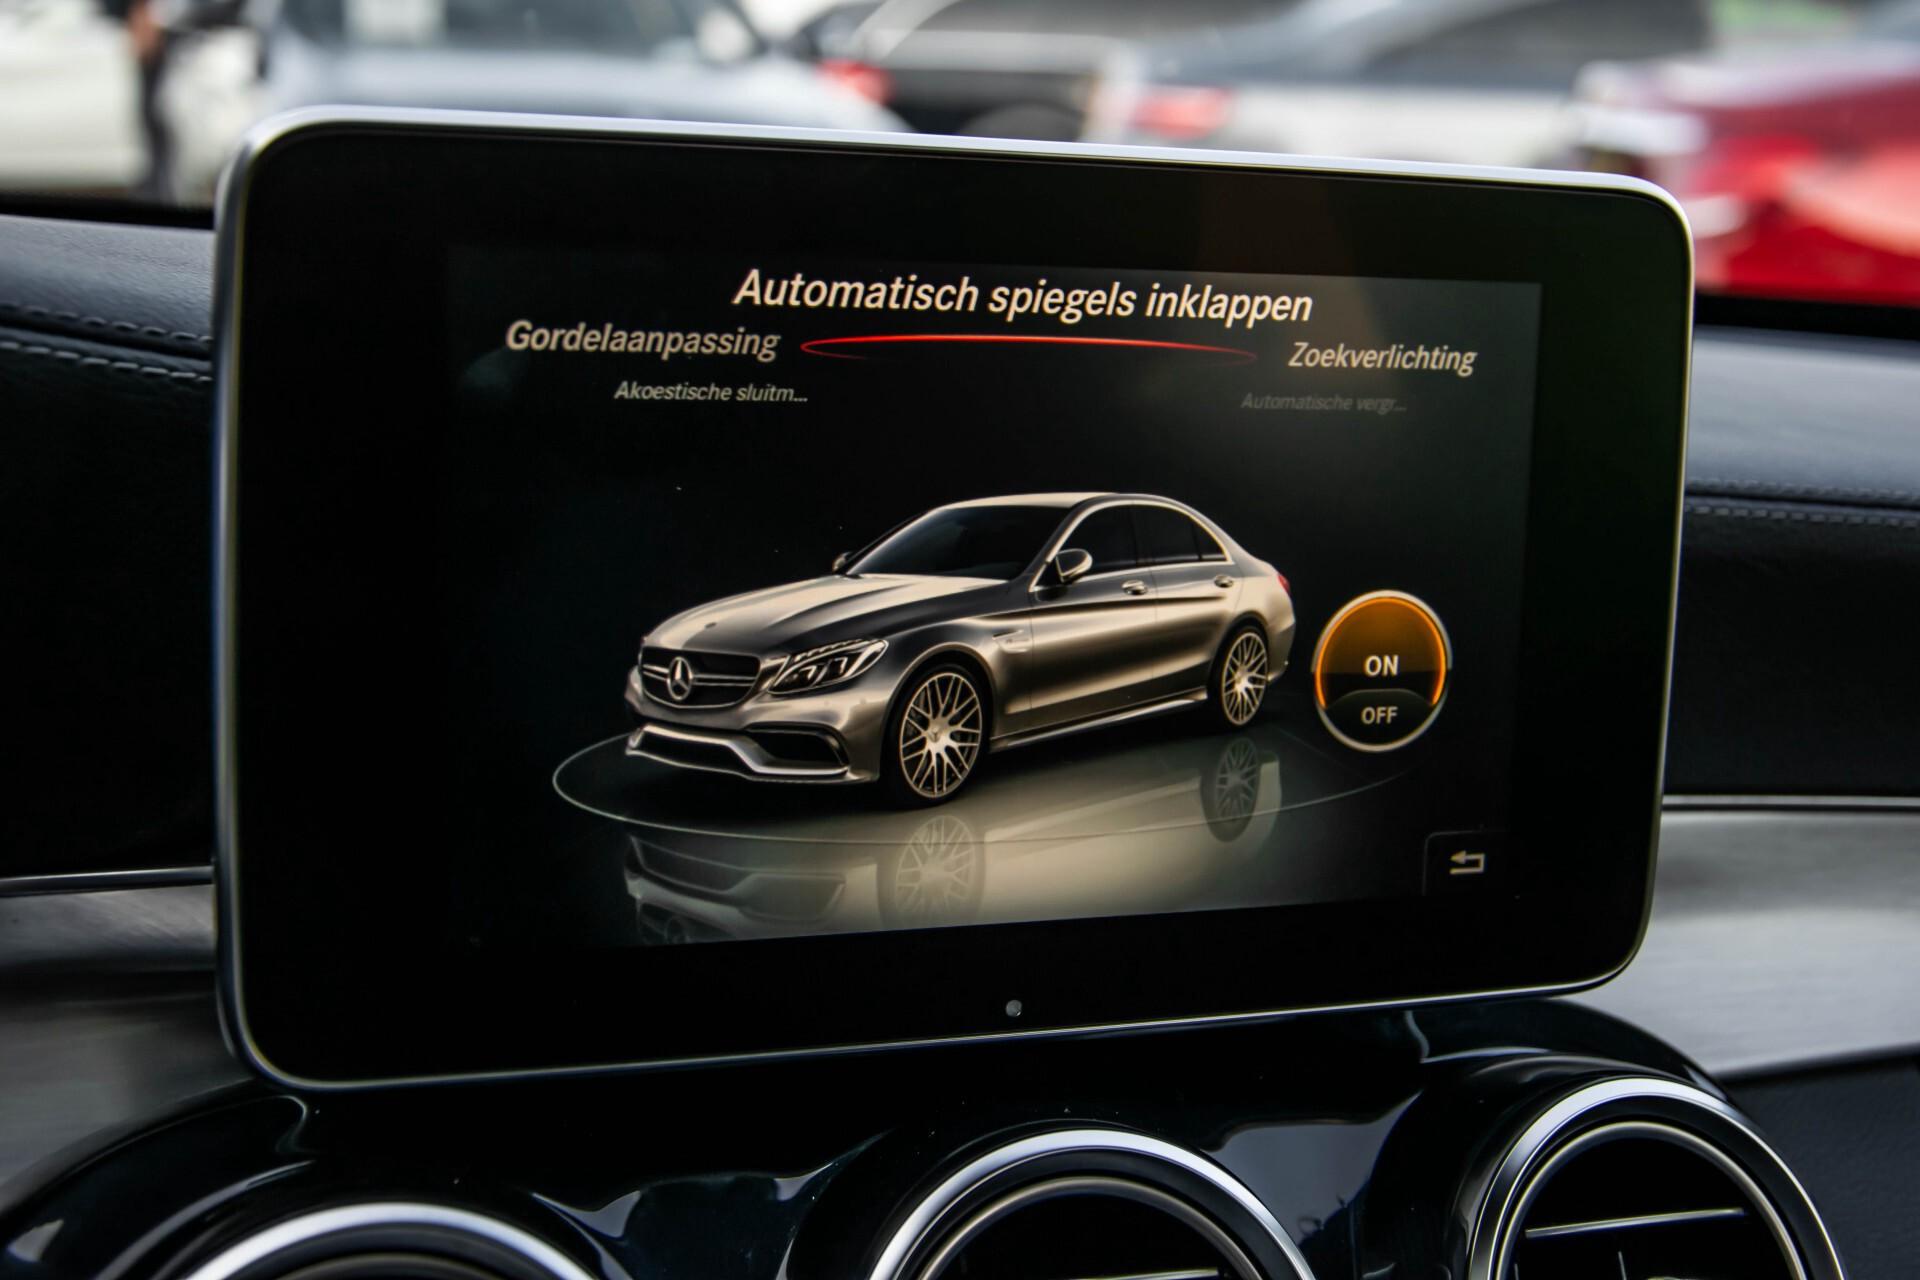 Mercedes-Benz C-Klasse 63 AMG S Panorama/Distronic/Keyless/Comand/Camera/ILS Aut7 Foto 34